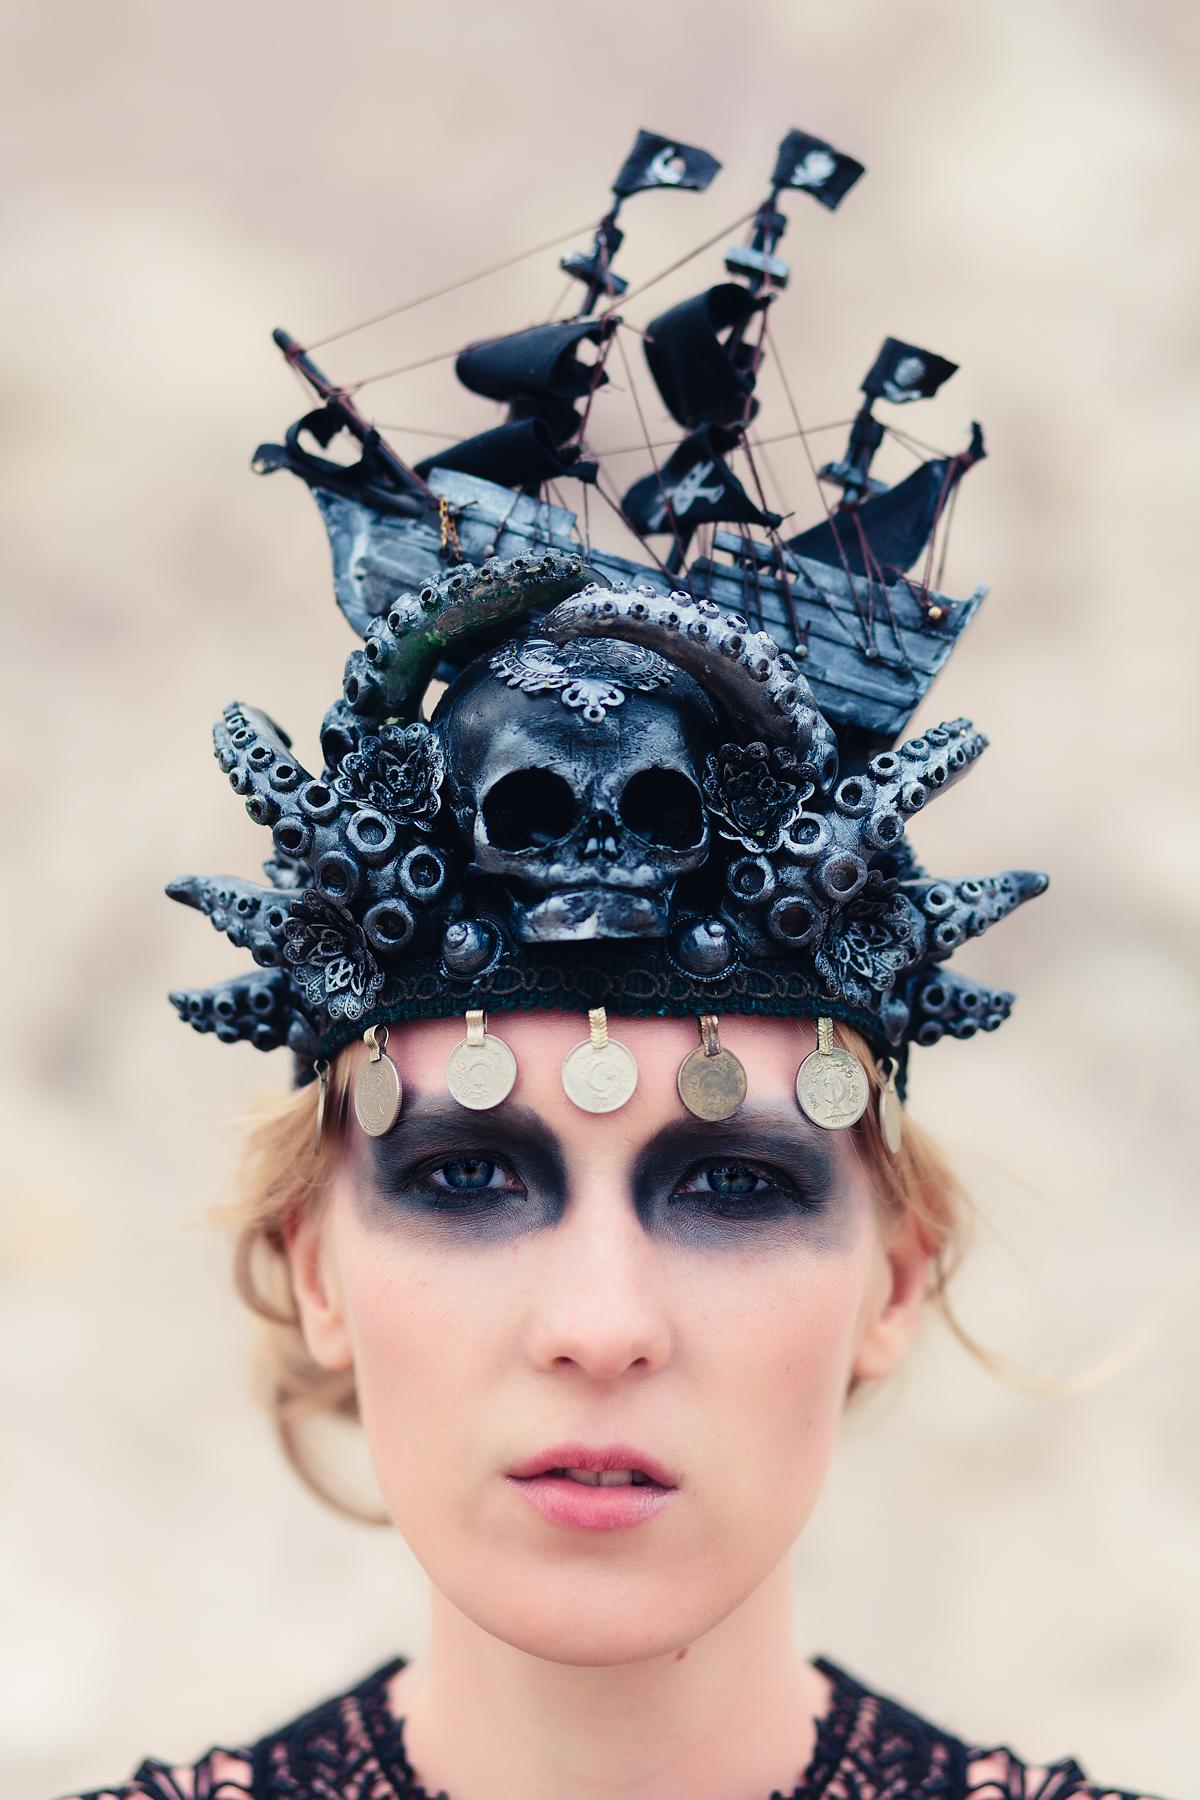 Woman wearing a pirate ship hat